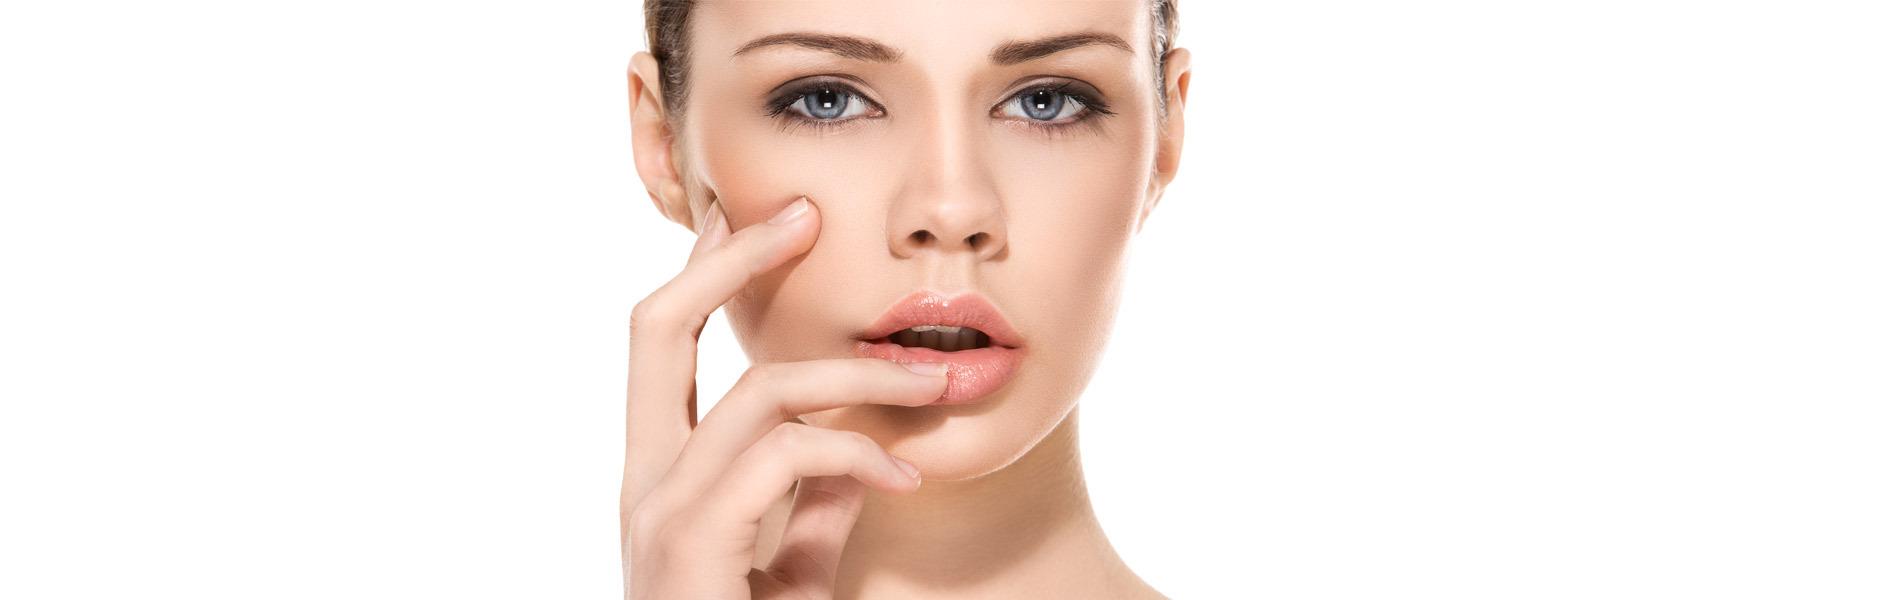 All about Lips: Lip Volume με Υαλουρονικό Οξύ για πιο γεμάτα χείλη